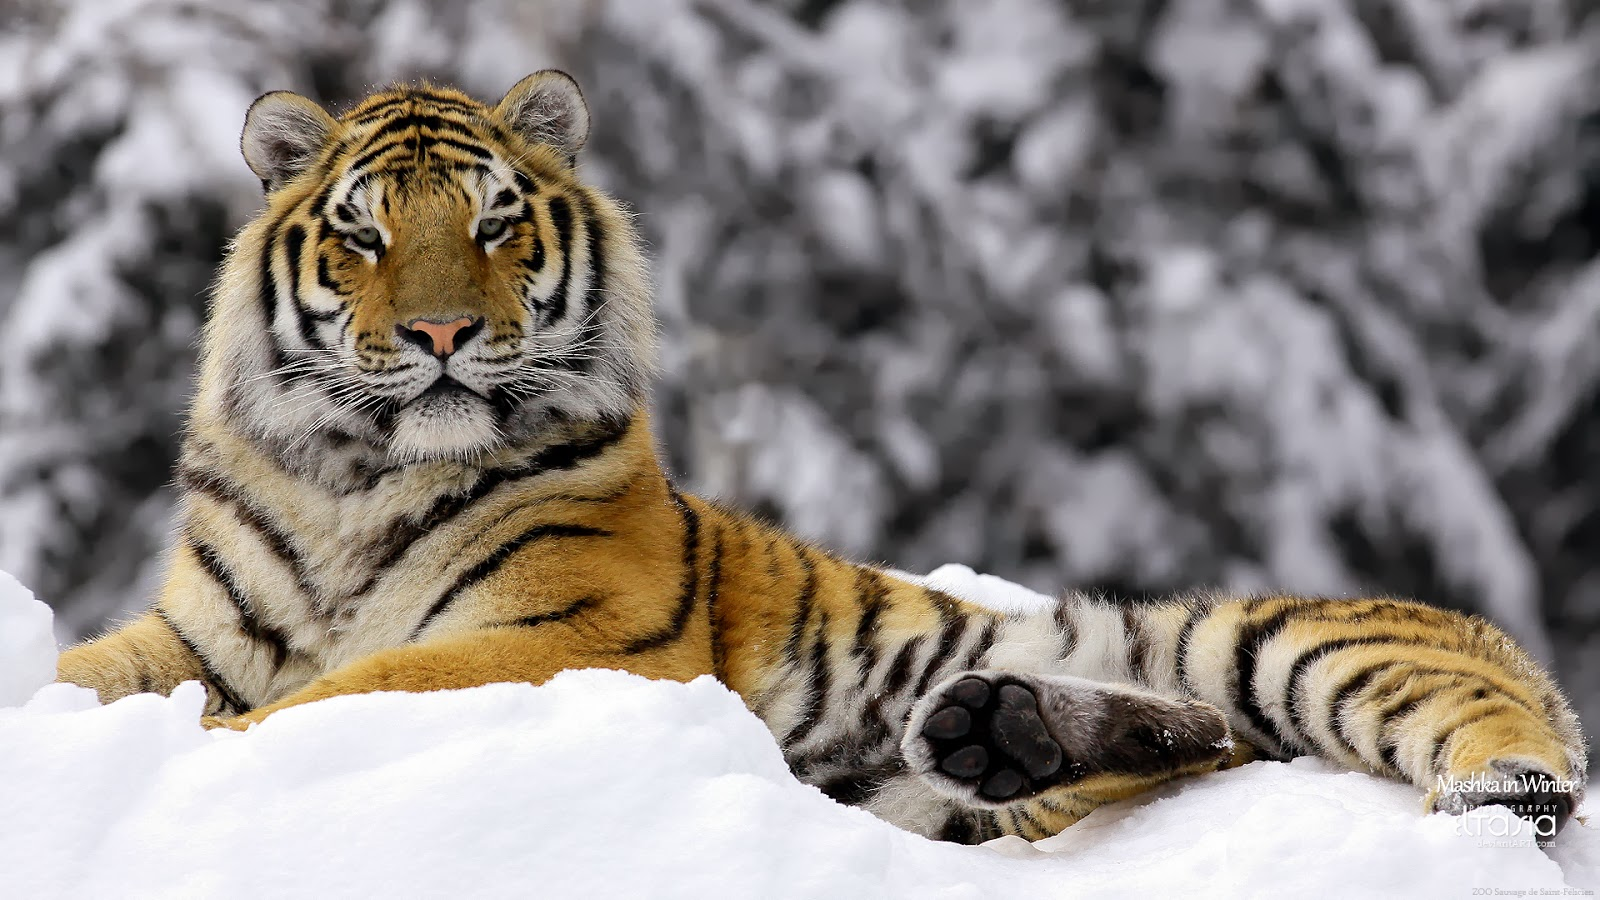 "<img src=""http://2.bp.blogspot.com/-TiXAaboLEw0/Ut5GEgcsJaI/AAAAAAAAJiM/Ovxek3Y_hLs/s1600/tiger-in-winter.jpg"" alt=""tiger in winter"" />"